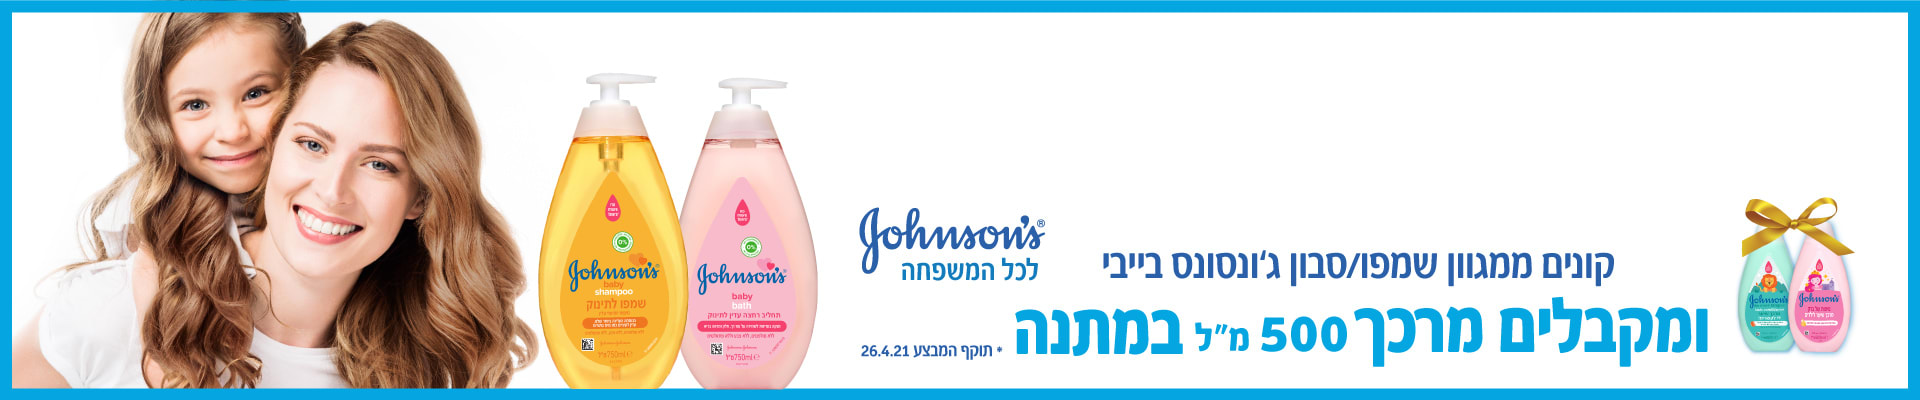 "JOHNSONS לכל המשפחה קונים ממגוון שמפו/סבון גו'נסונס בייבי ומקבלים מרכך 500 מ""ל במתנה * תוקף המבצע 26.4.21"